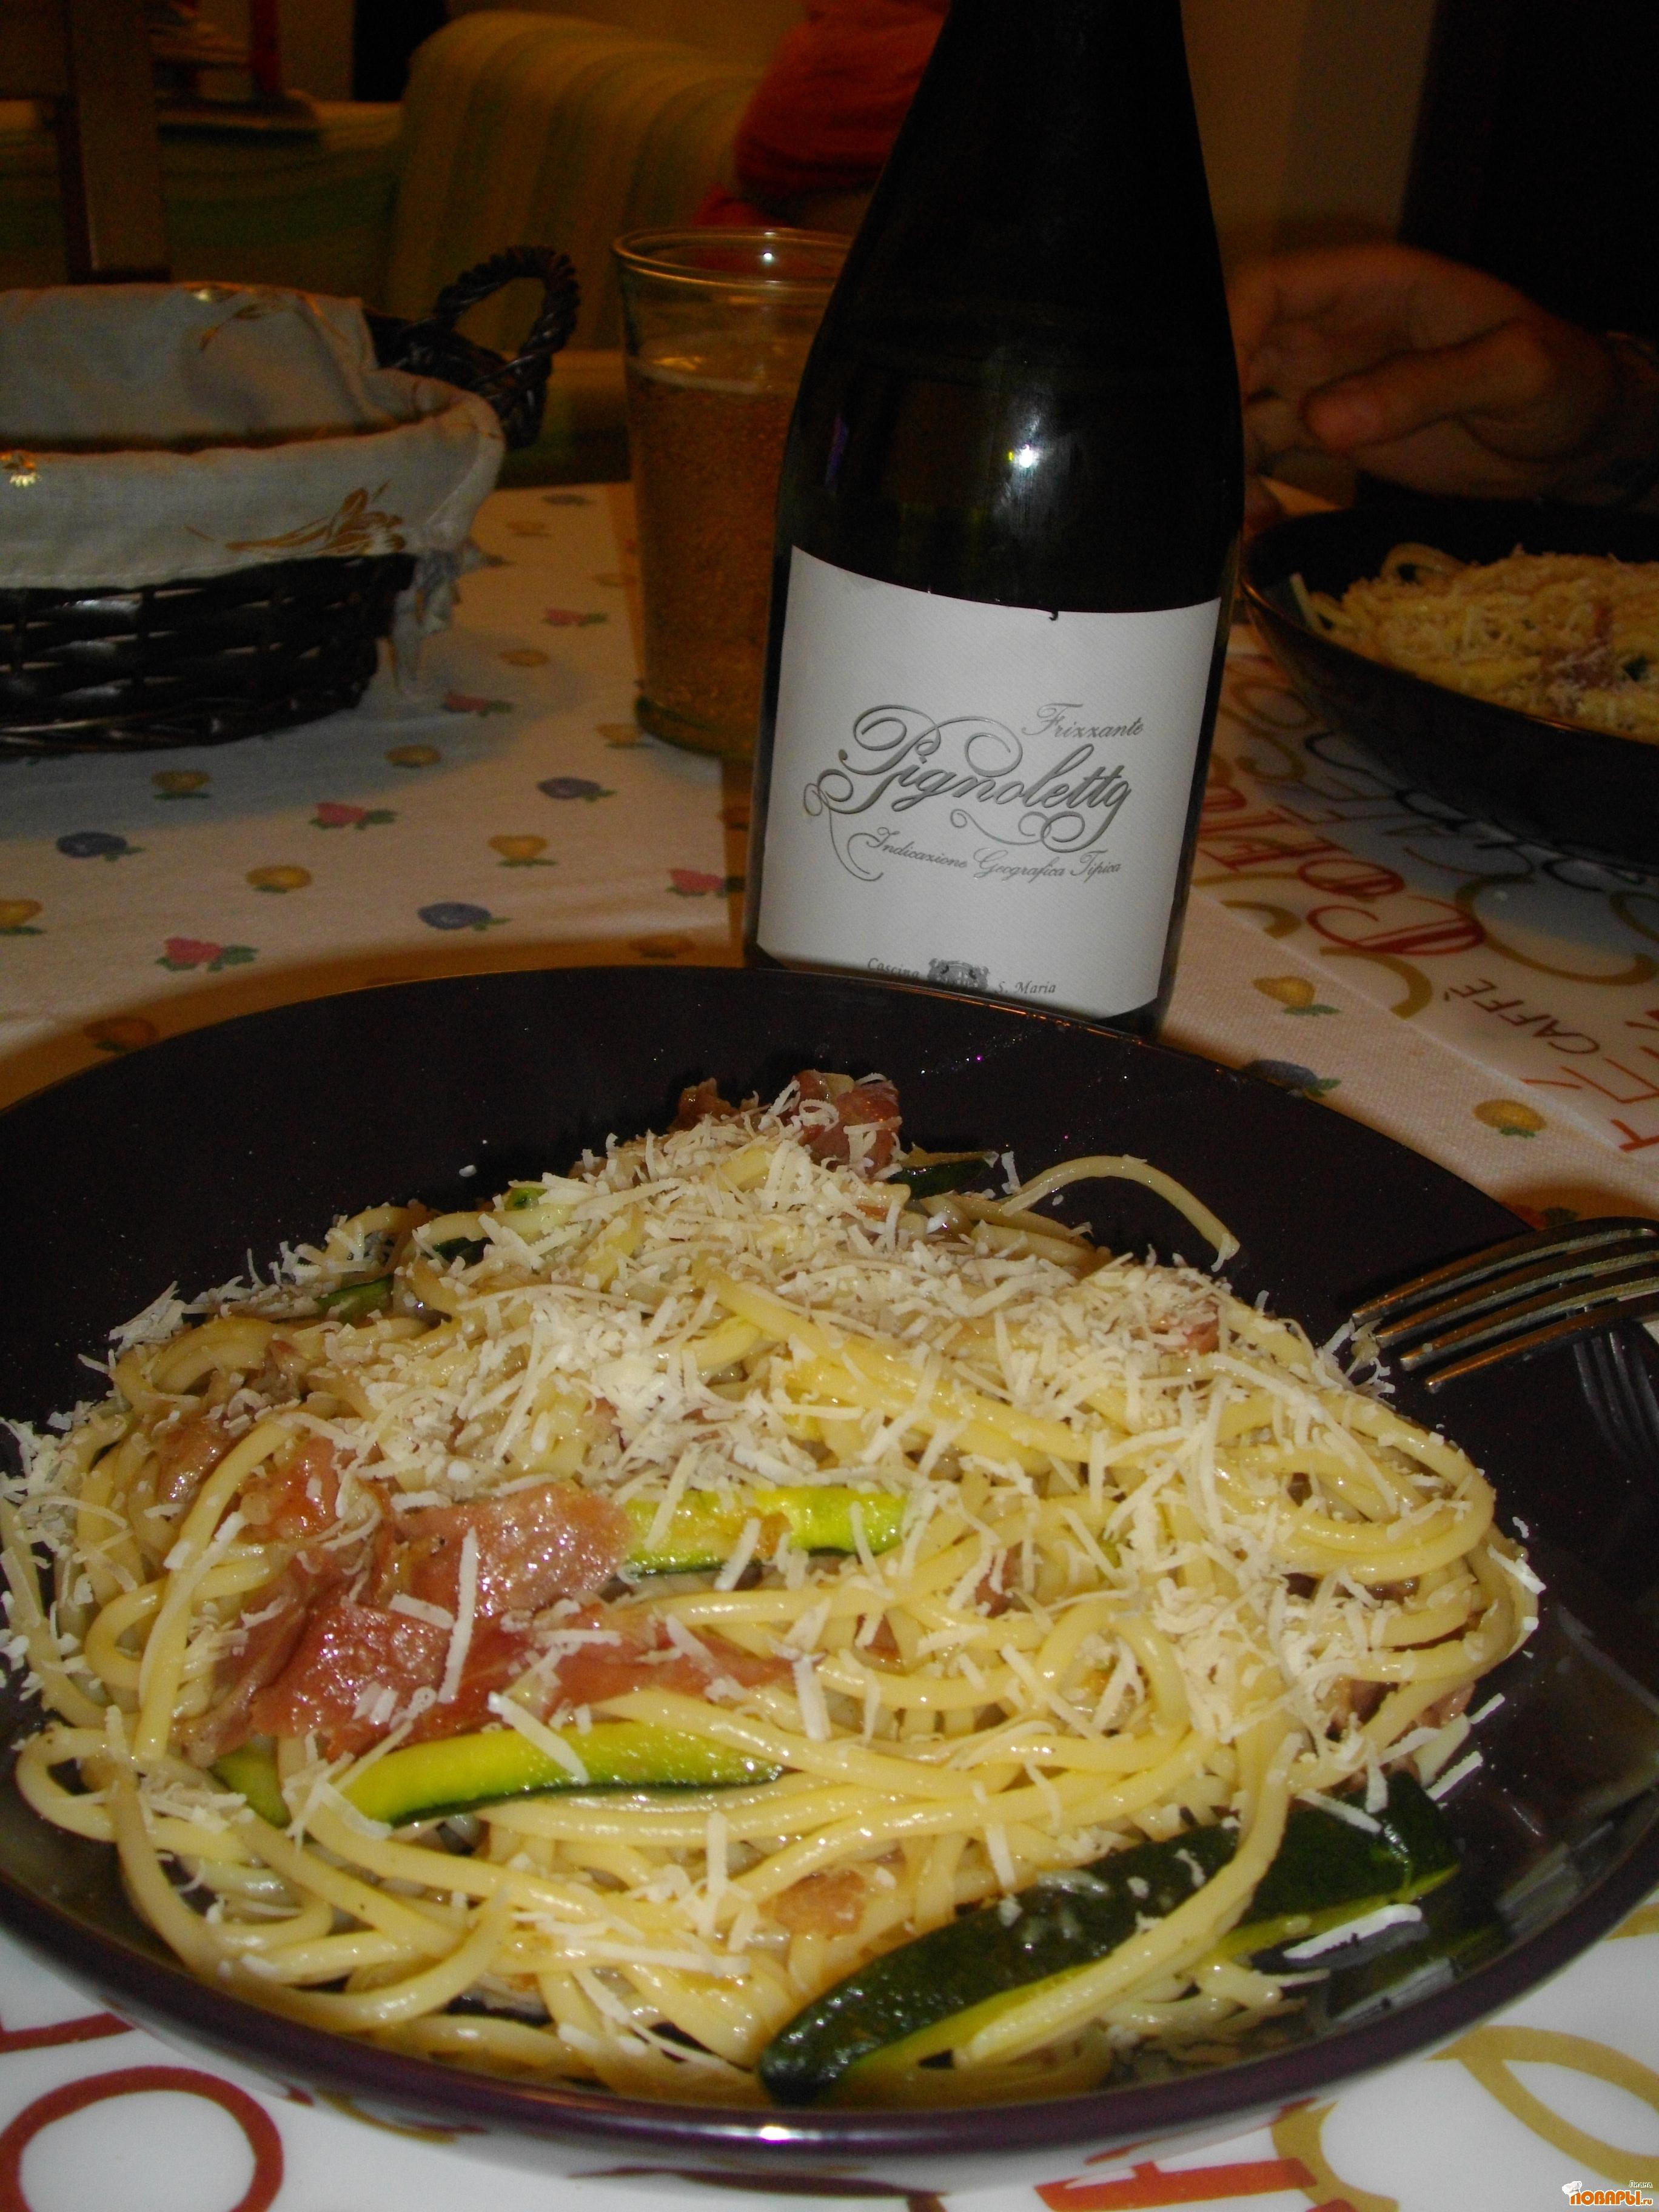 Рецепт Спагетти кон прошутто крудо е цуккини. (Спагетти с сыровяленной ветчиной и цуккини).